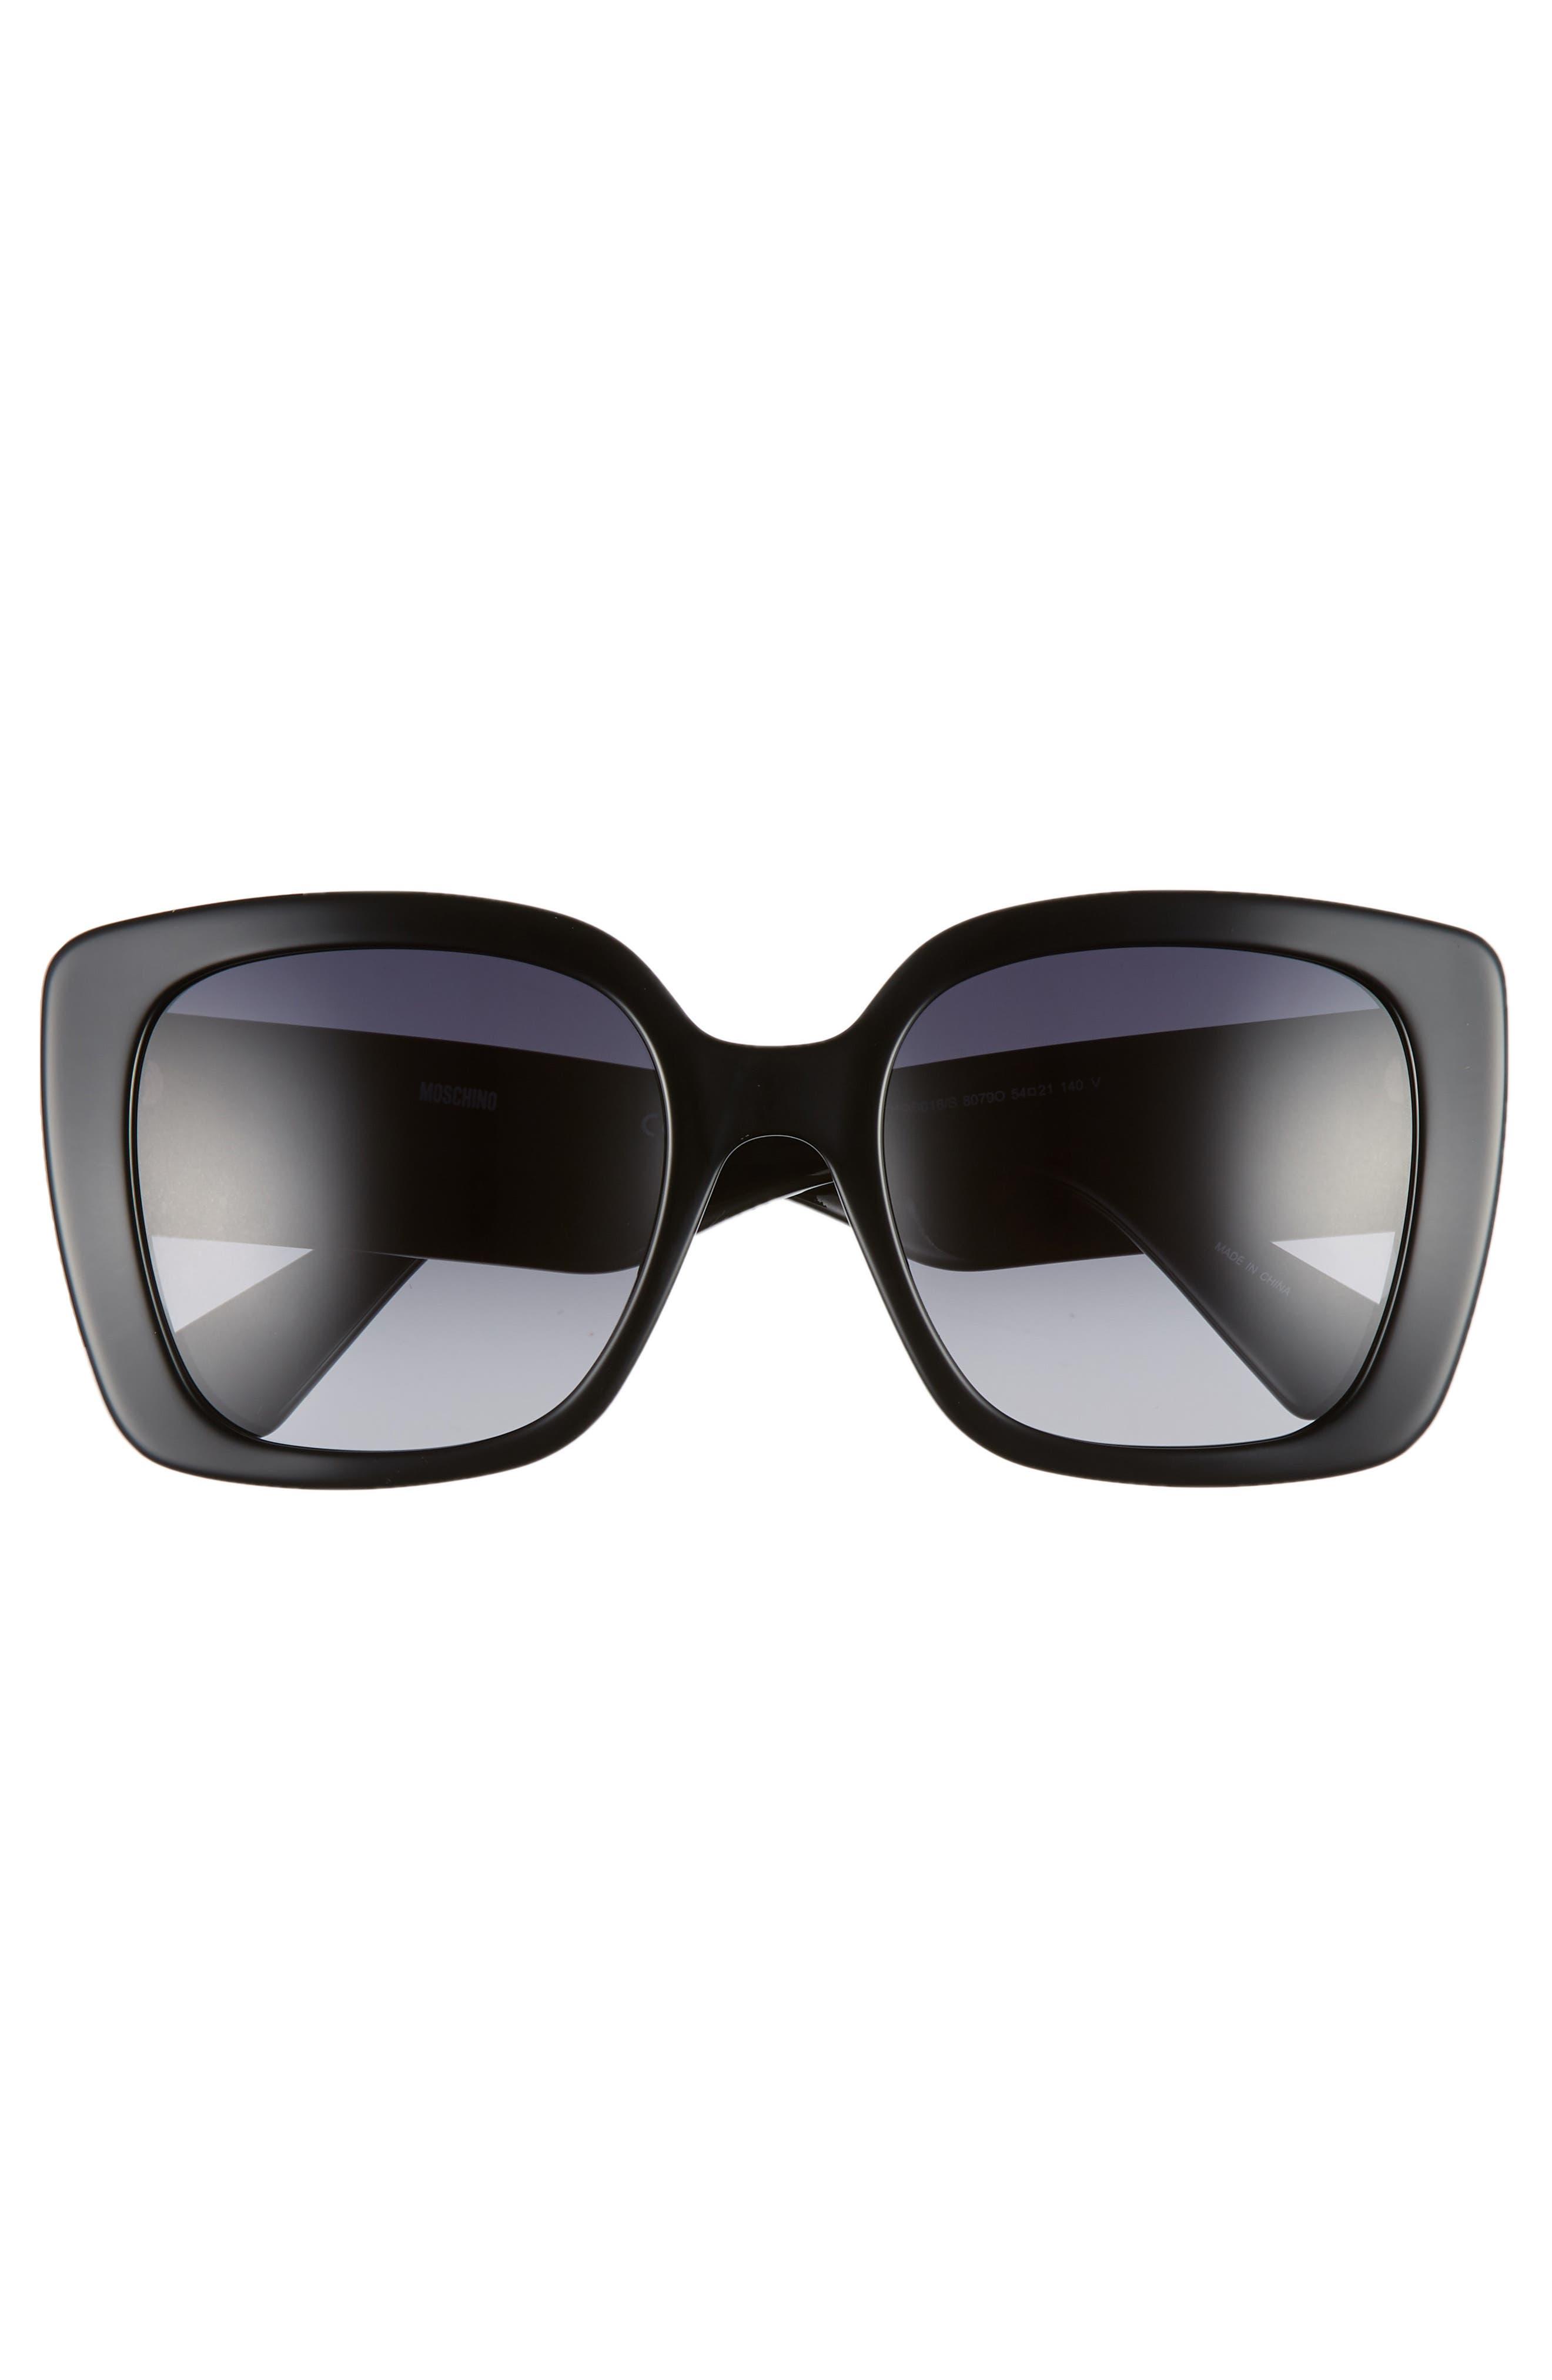 MOSCHINO, 54mm Square Sunglasses, Alternate thumbnail 3, color, BLACK